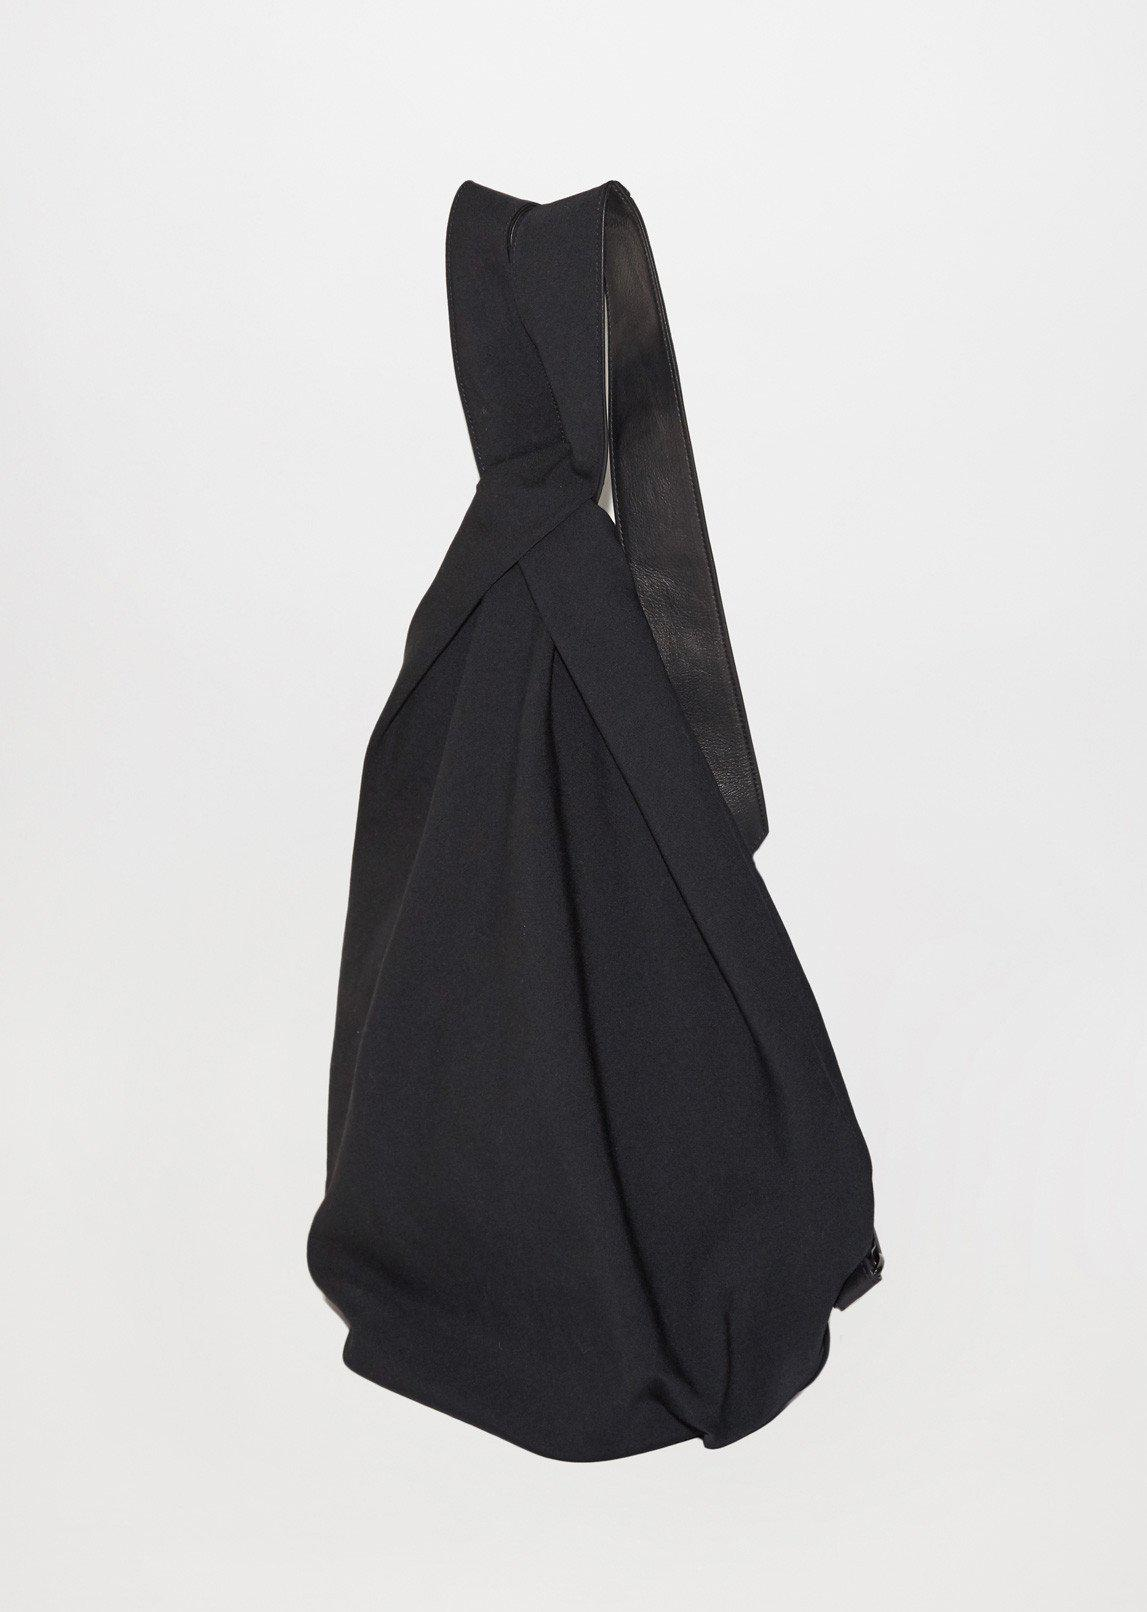 Lyst - Yohji Yamamoto Wrinkle Gabardine Drape Backpack in Black 75e4be138c